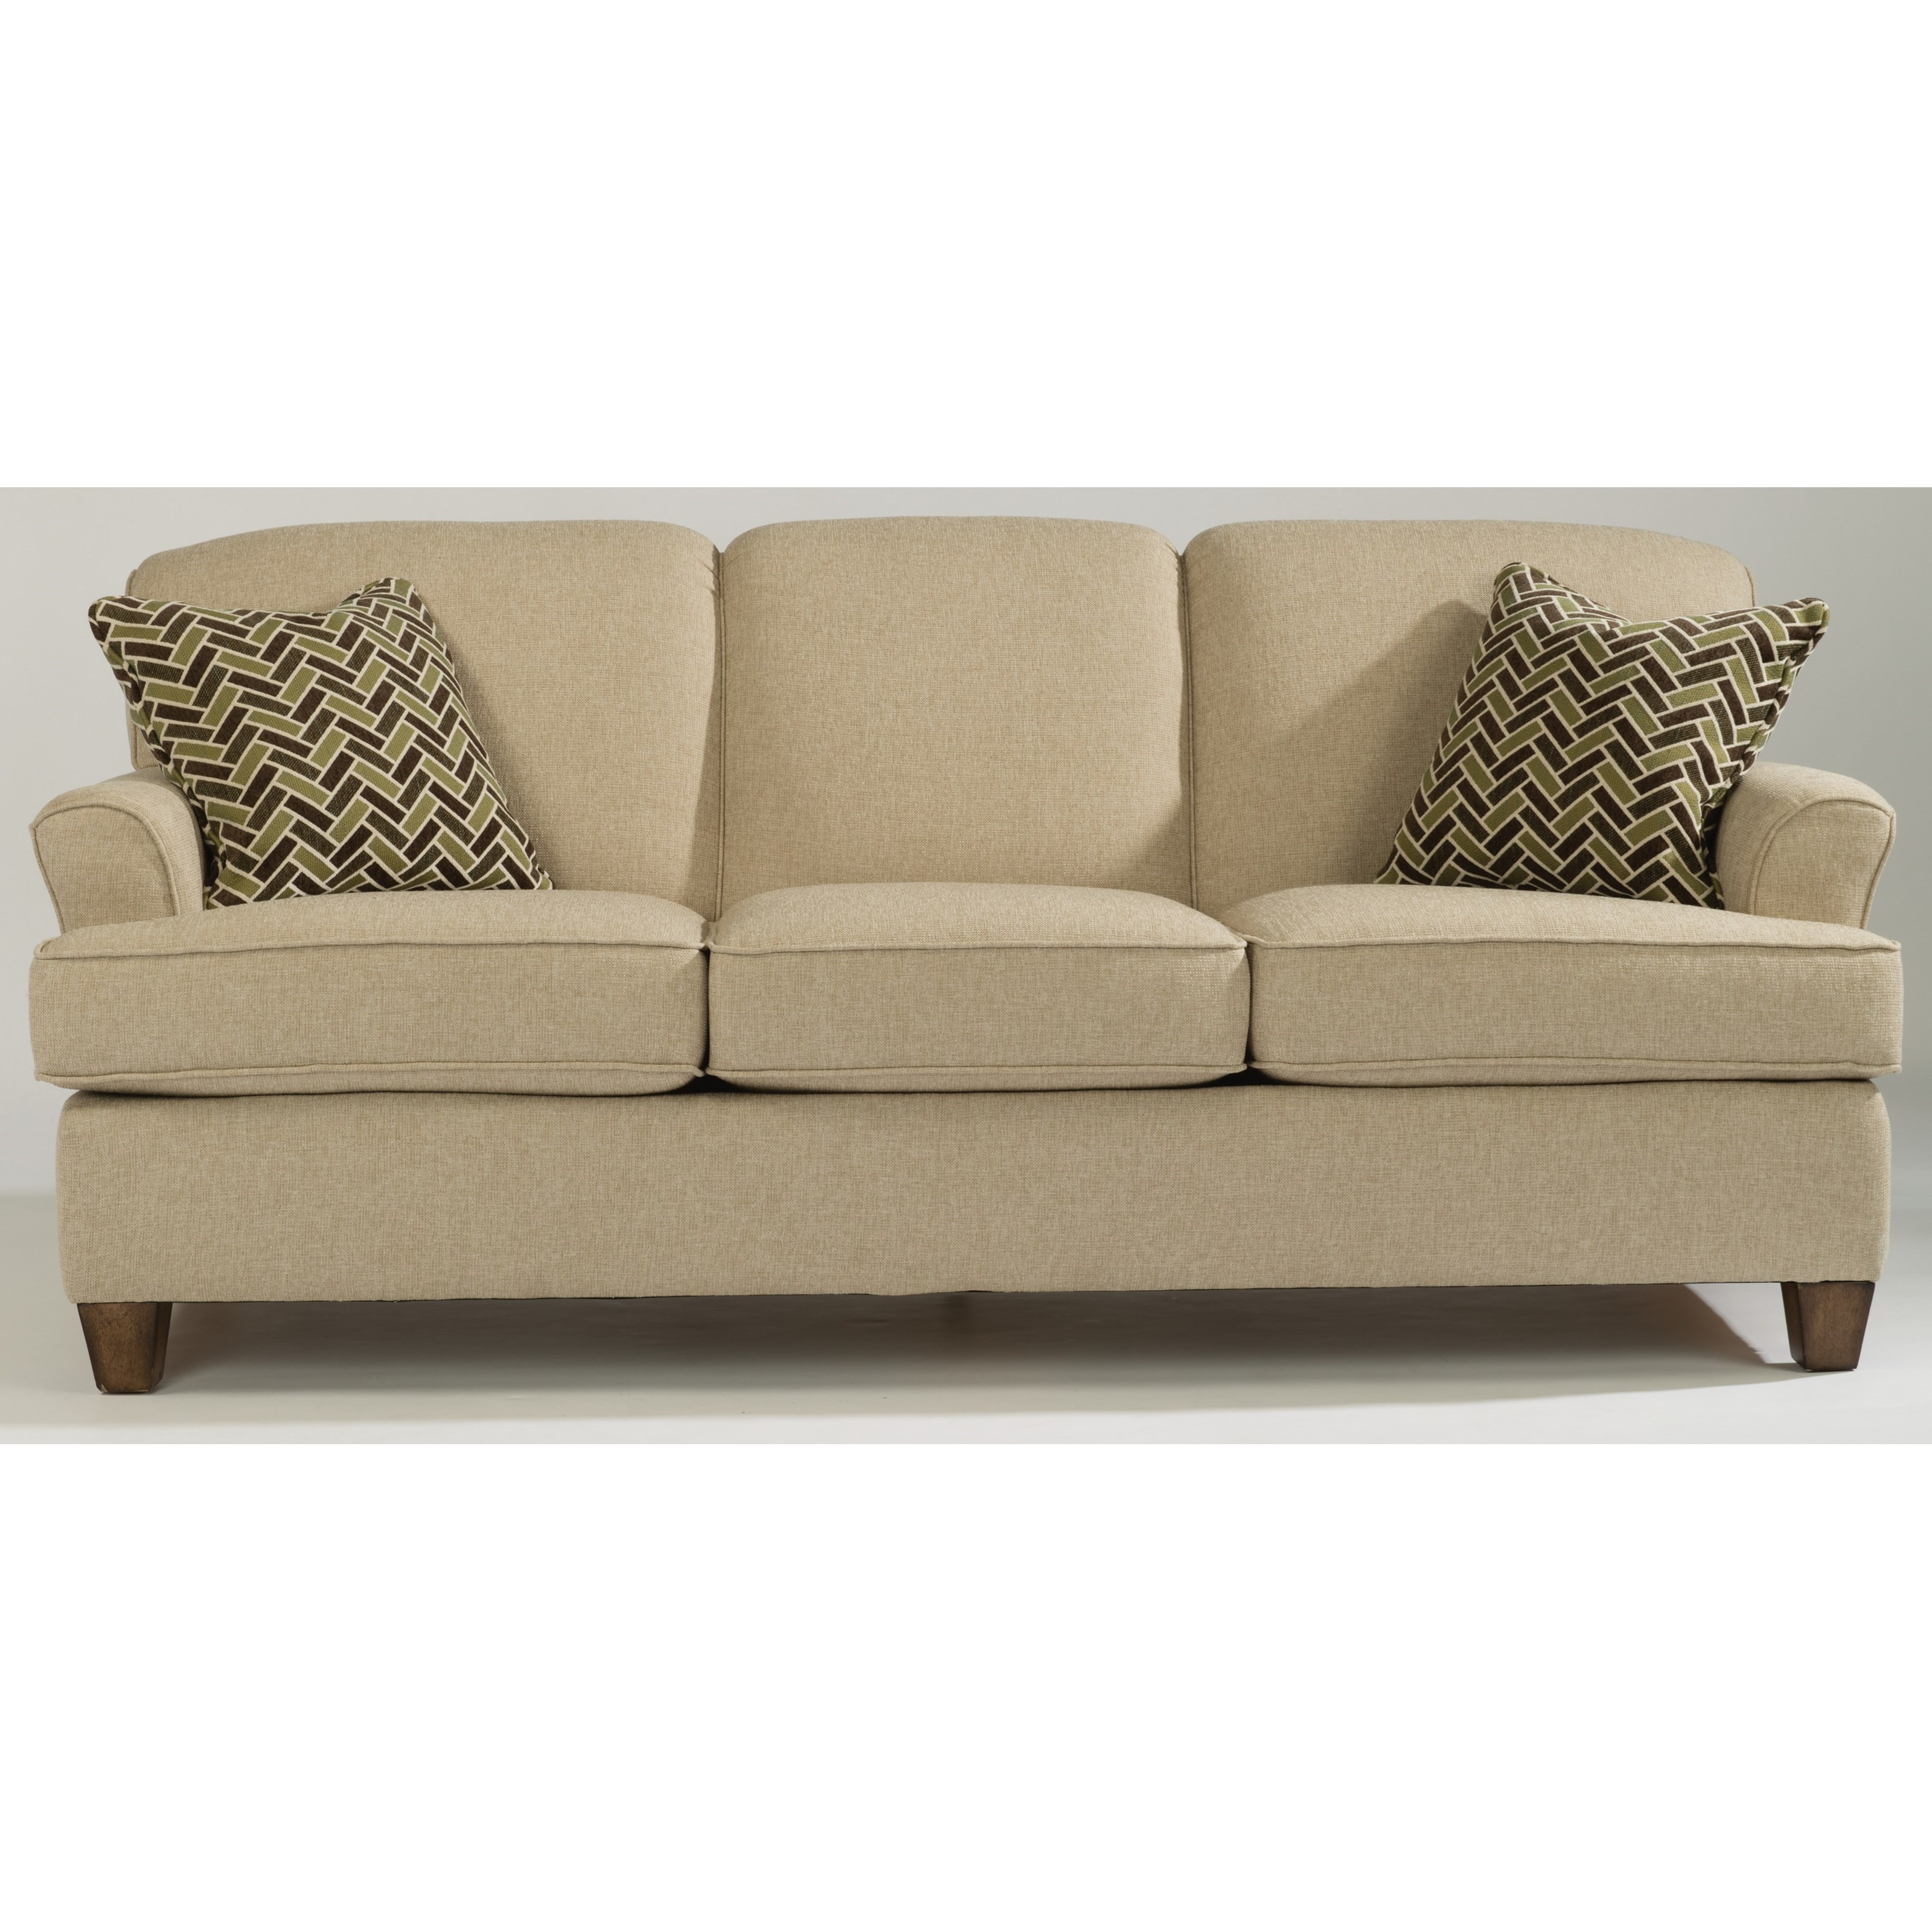 Flexsteel atlantis casual sofa with flared arms belfort for Sofas el tresillo